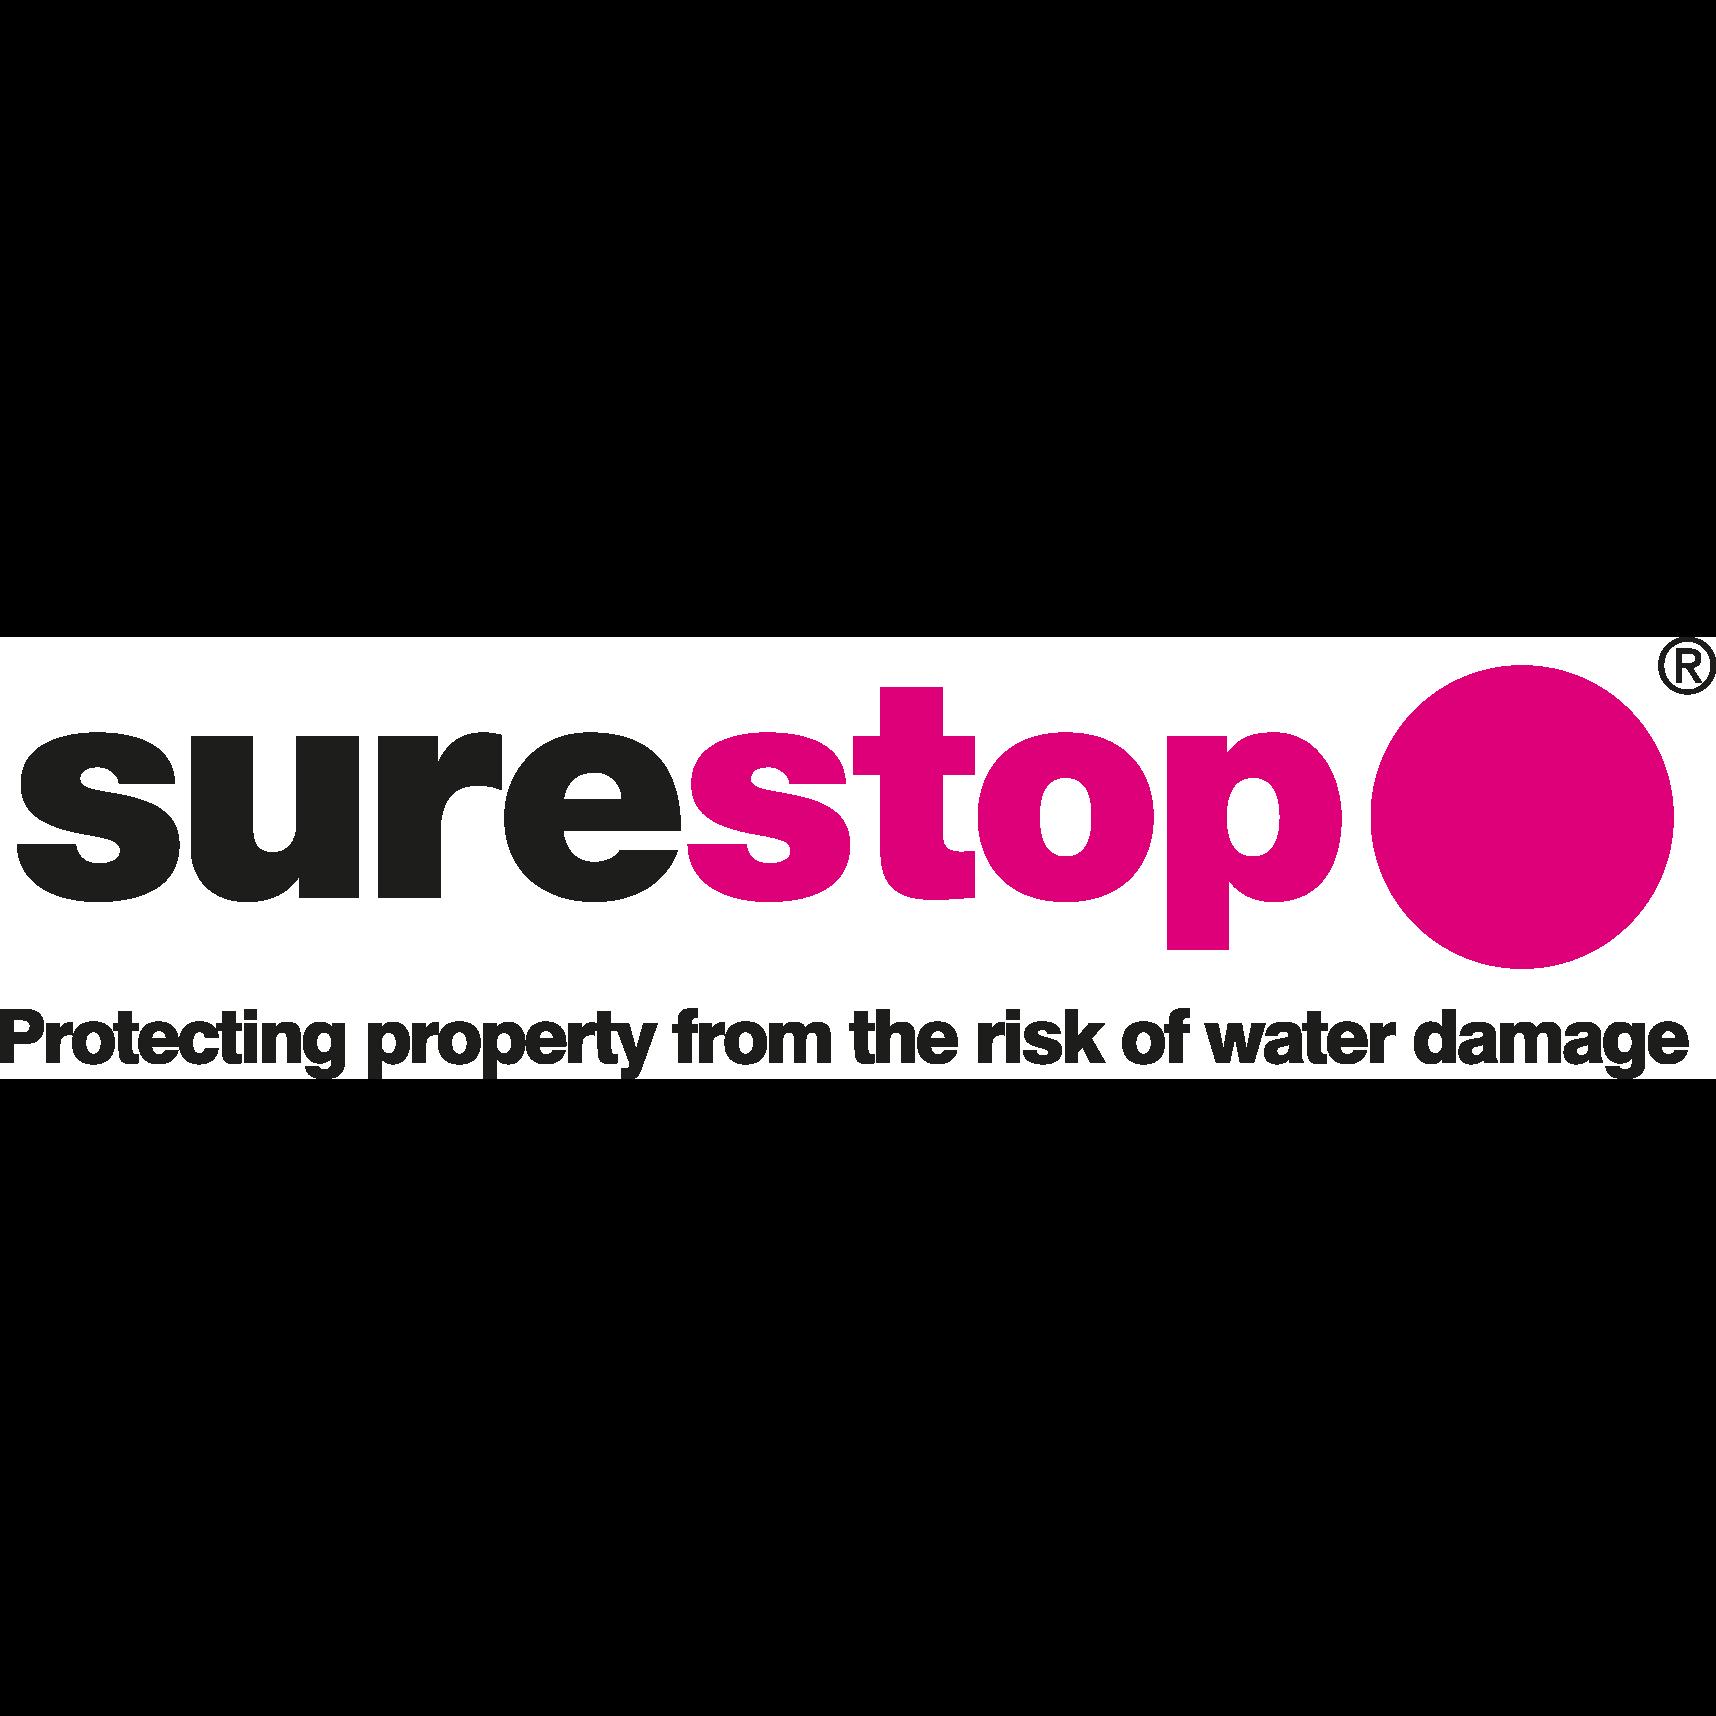 Surestop Logo